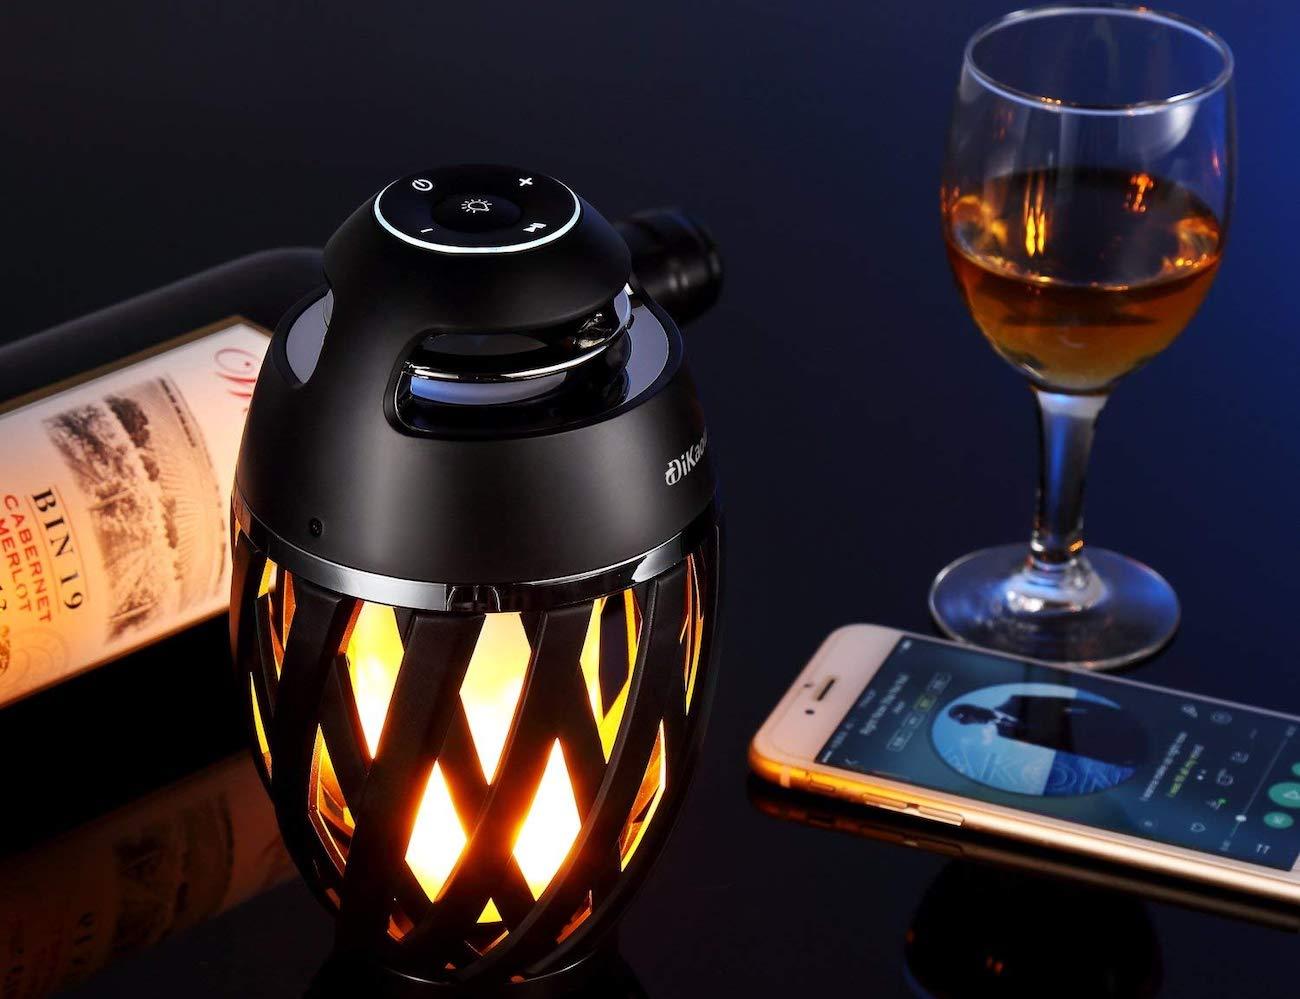 DiKaou LED Table Lamp Bluetooth Speaker emits high-quality sound